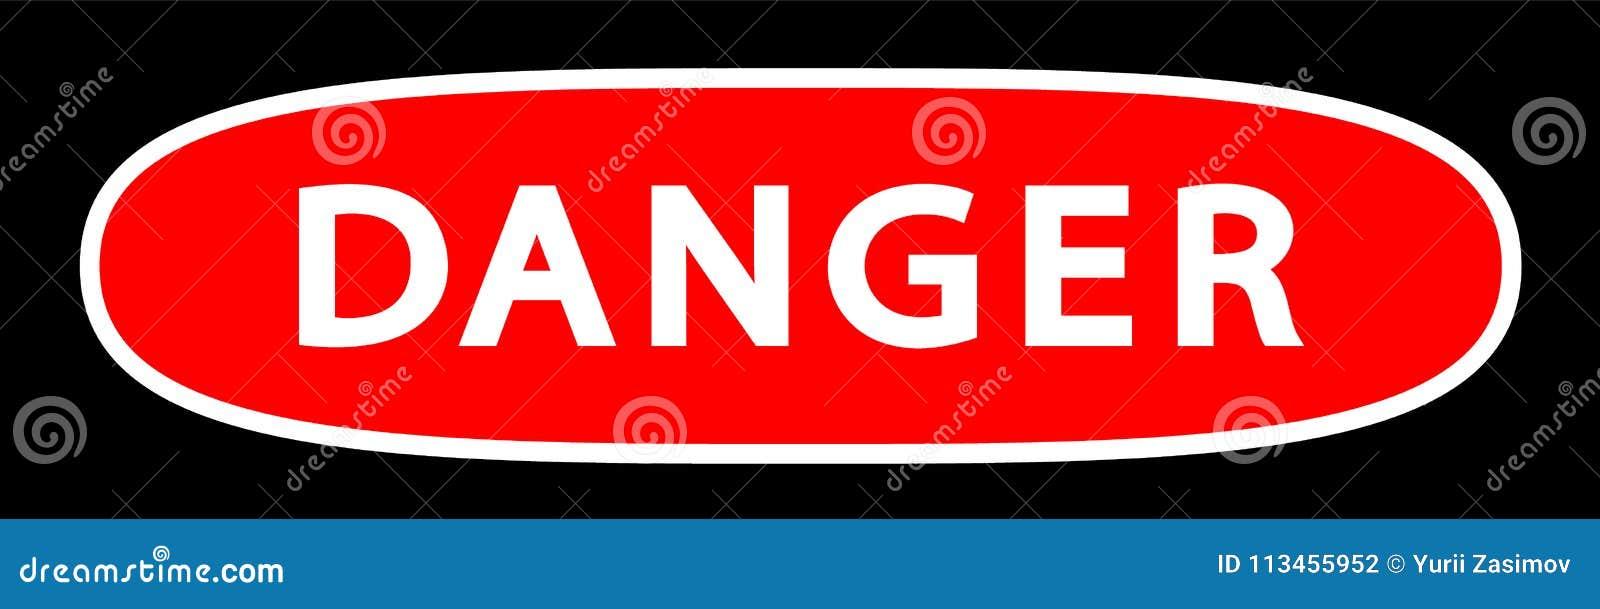 Danger Sign vector Illustration  Stock Vector - Illustration of